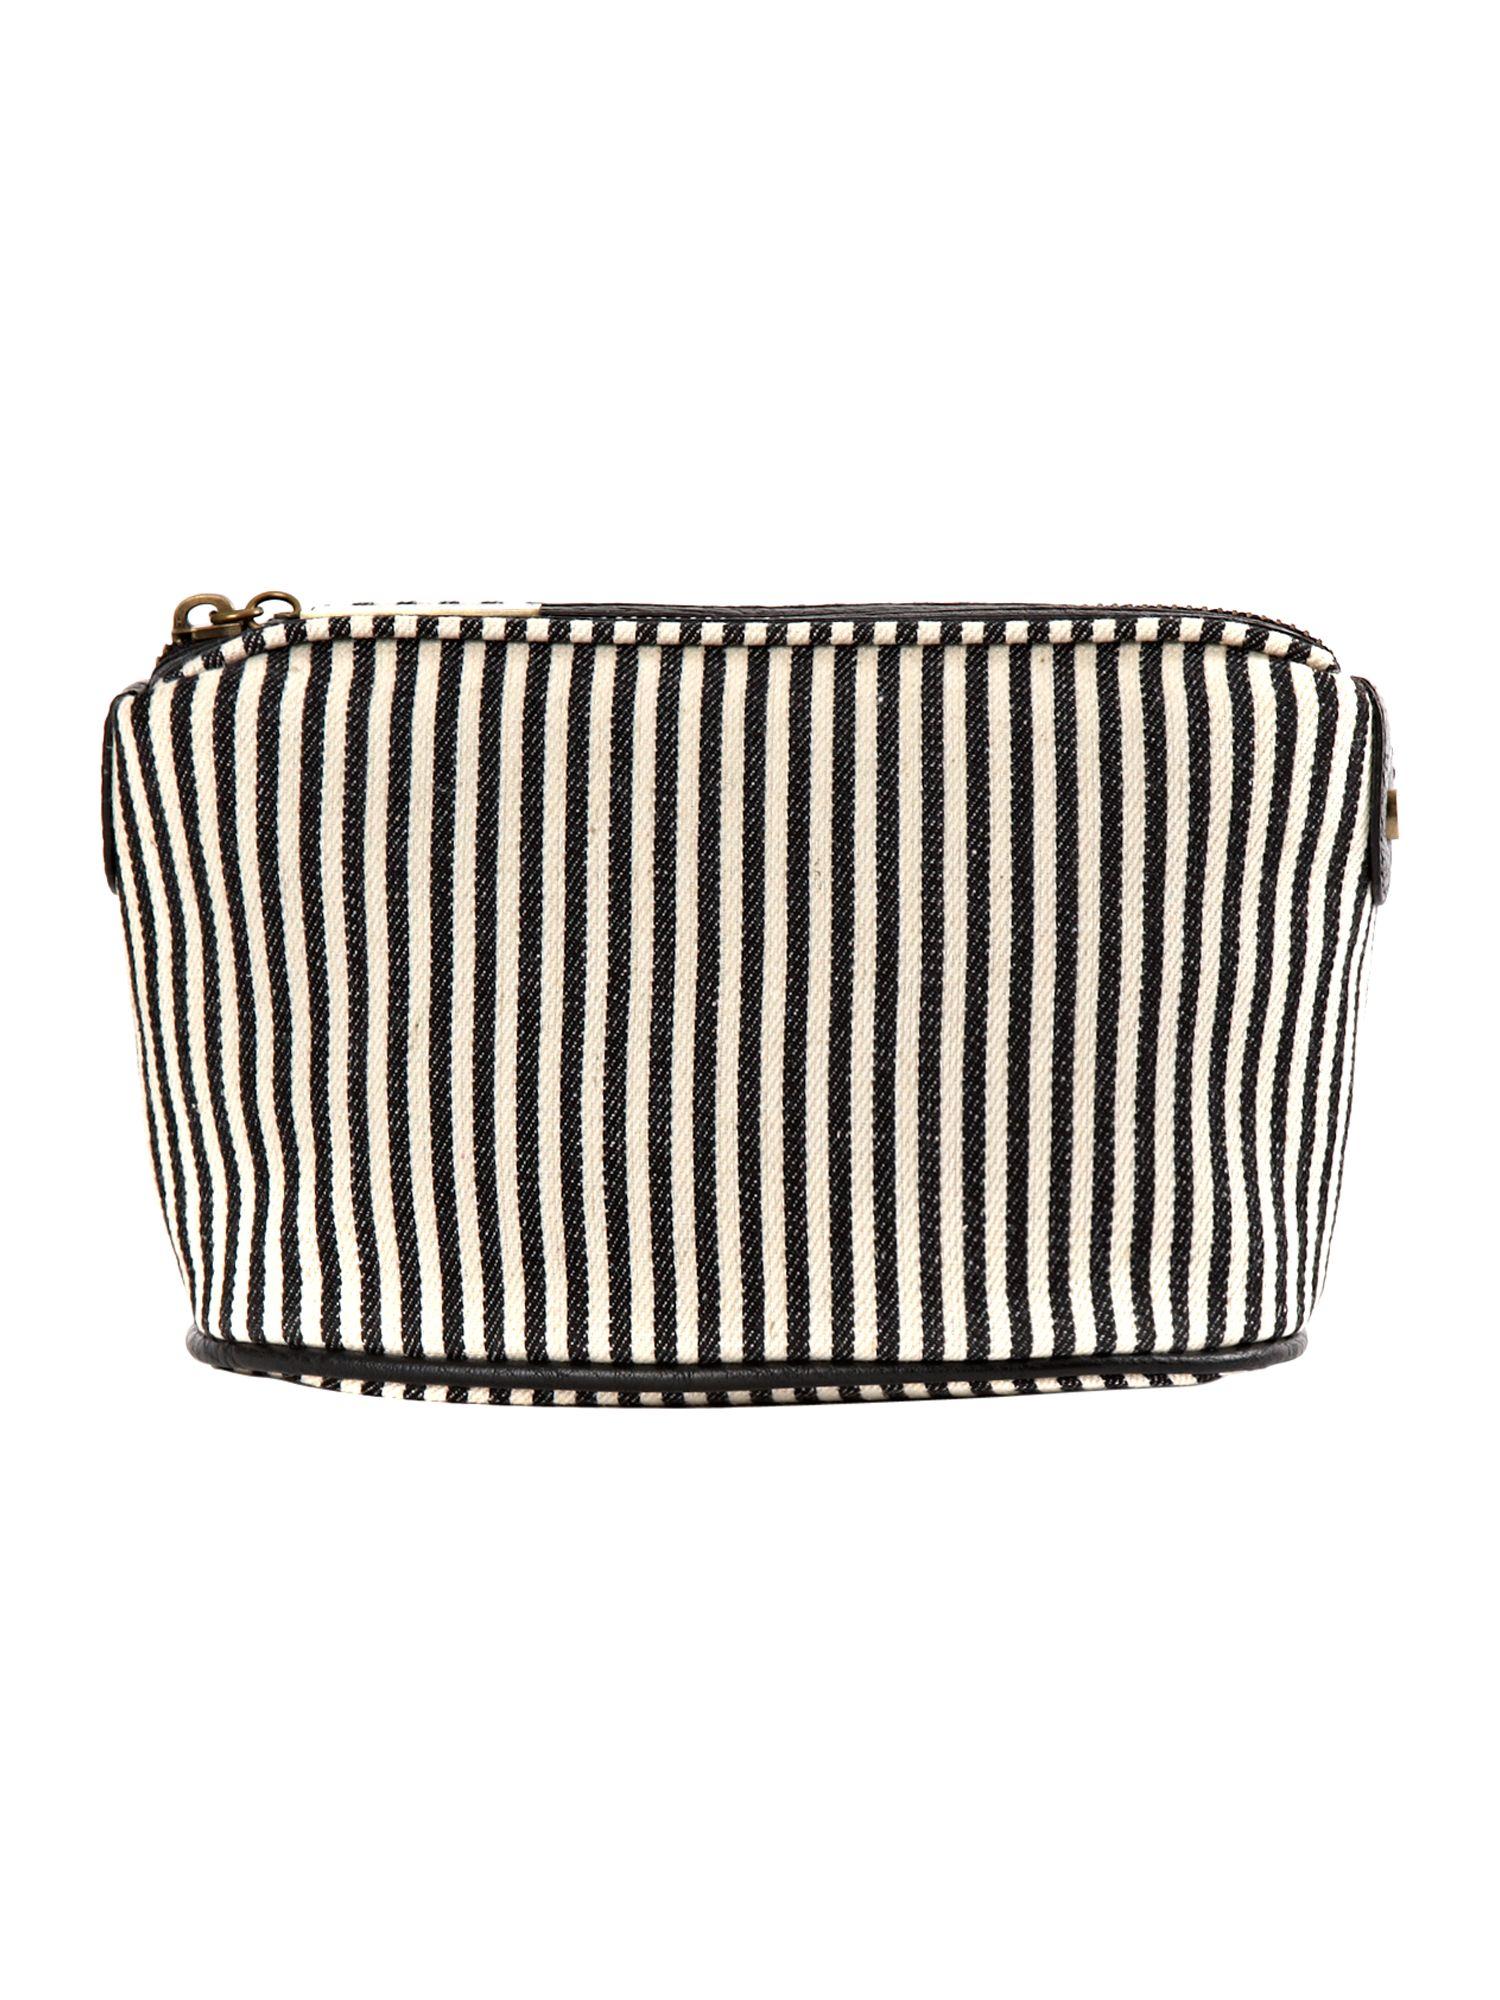 Timney Stripe Print Small Cosmetic Bag Black Multi